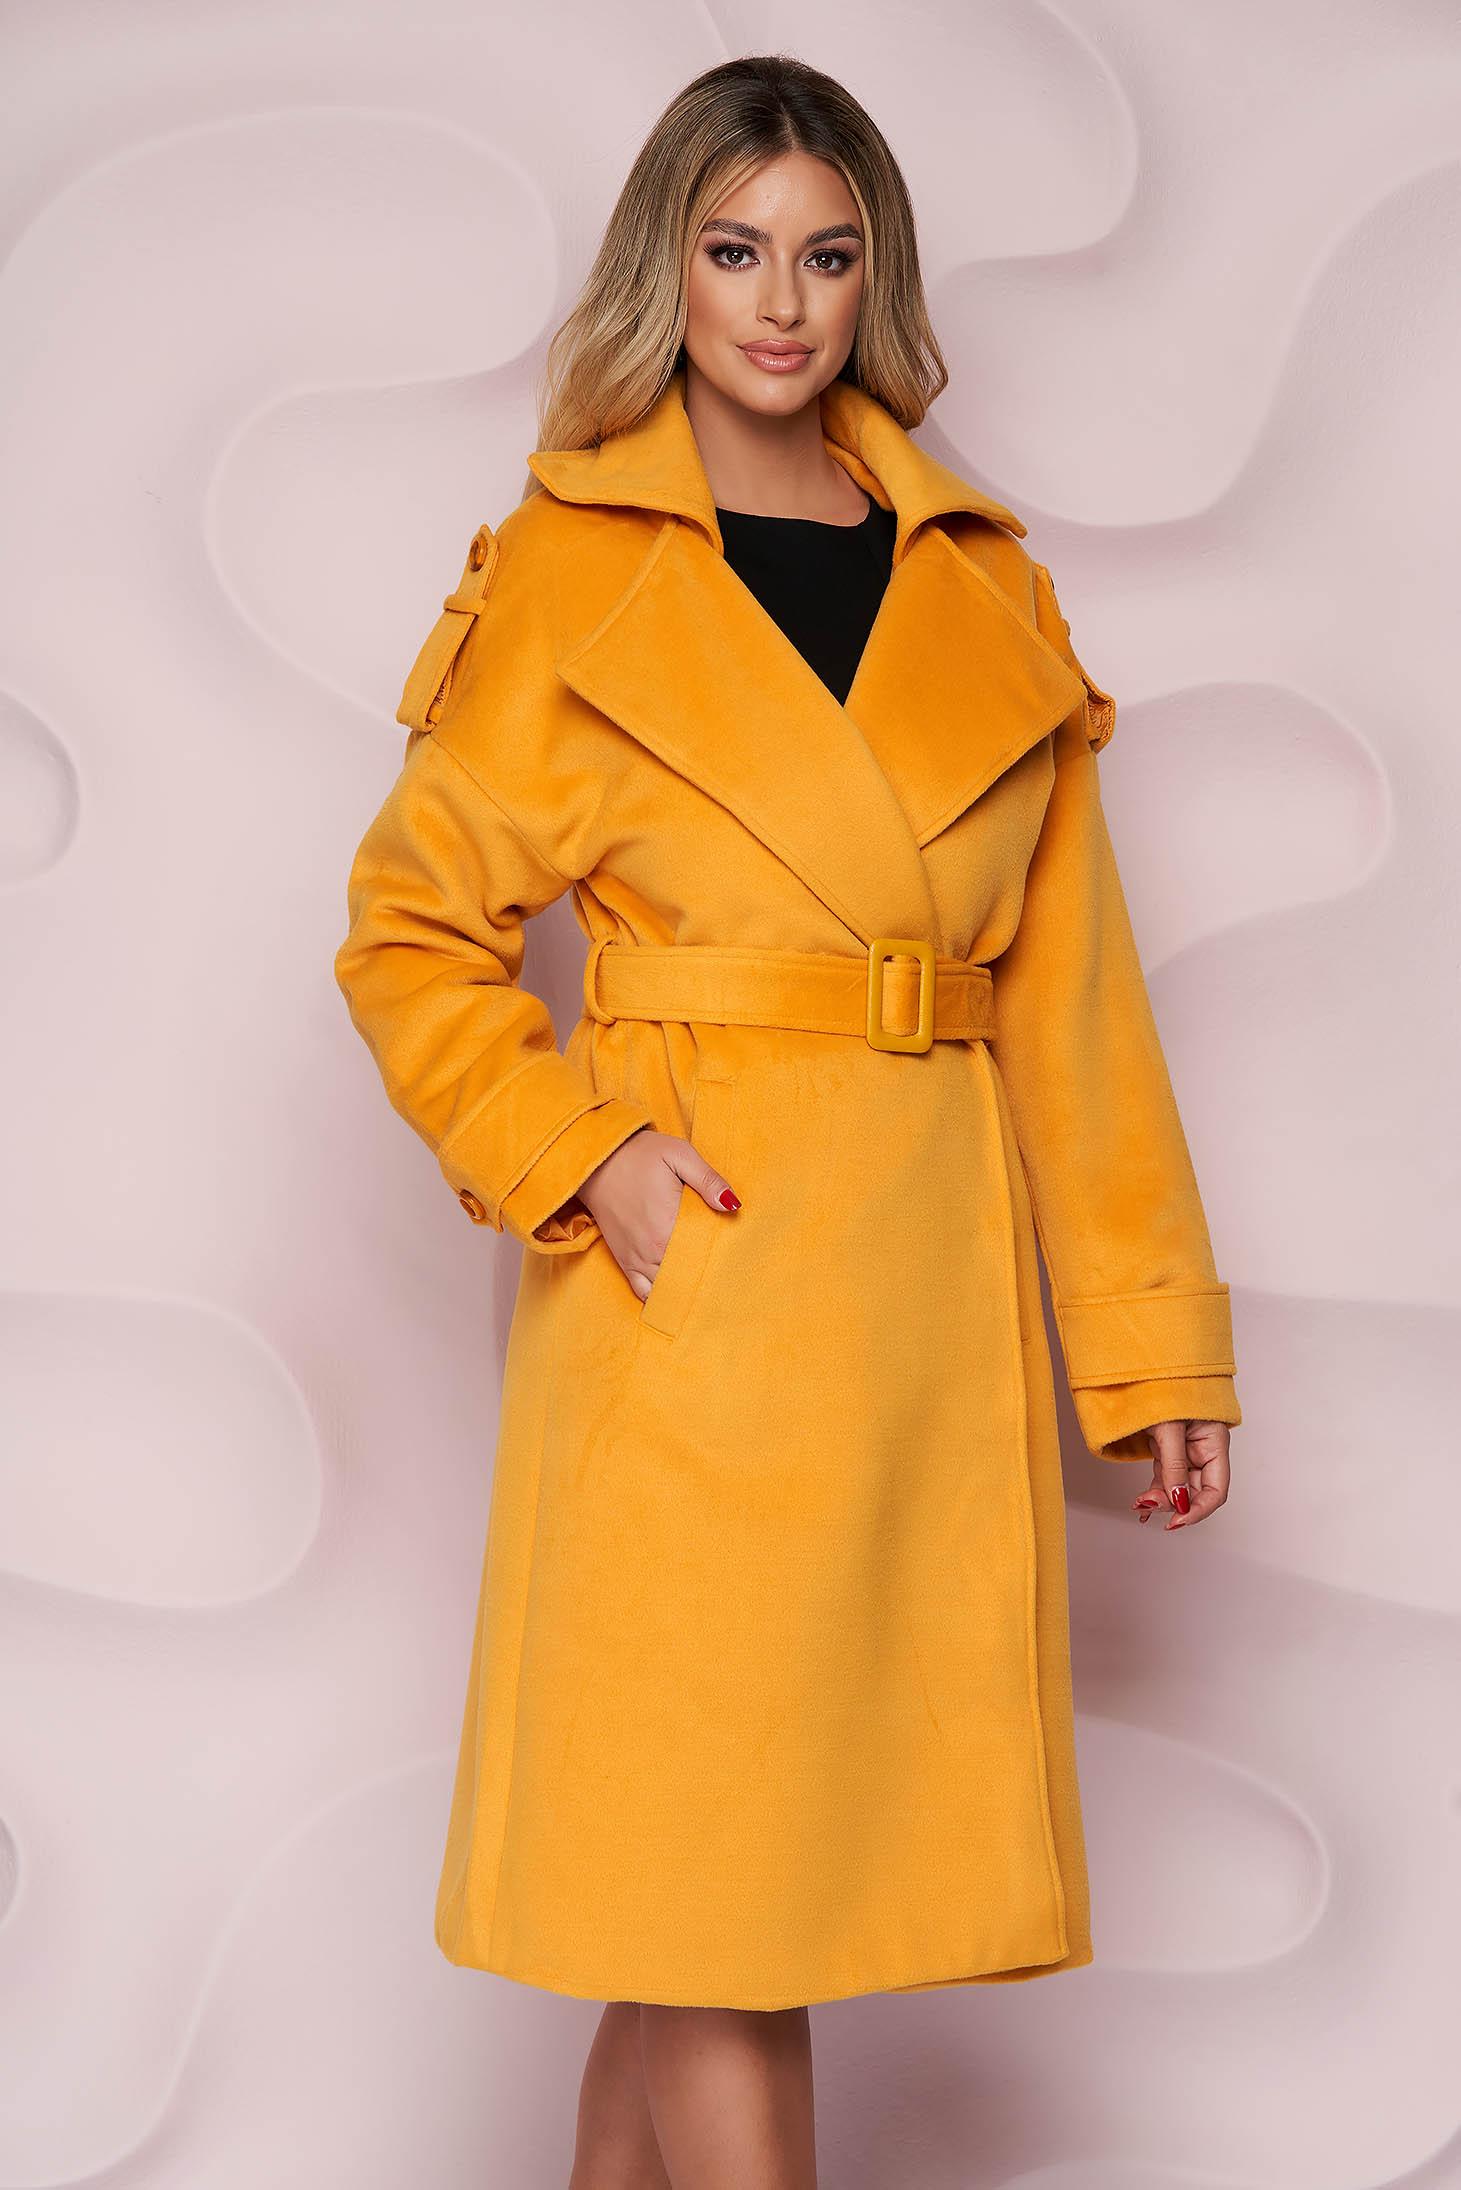 Palton SunShine mustariu casual lung cu croi larg din material gros din stofa si cordon detasabil